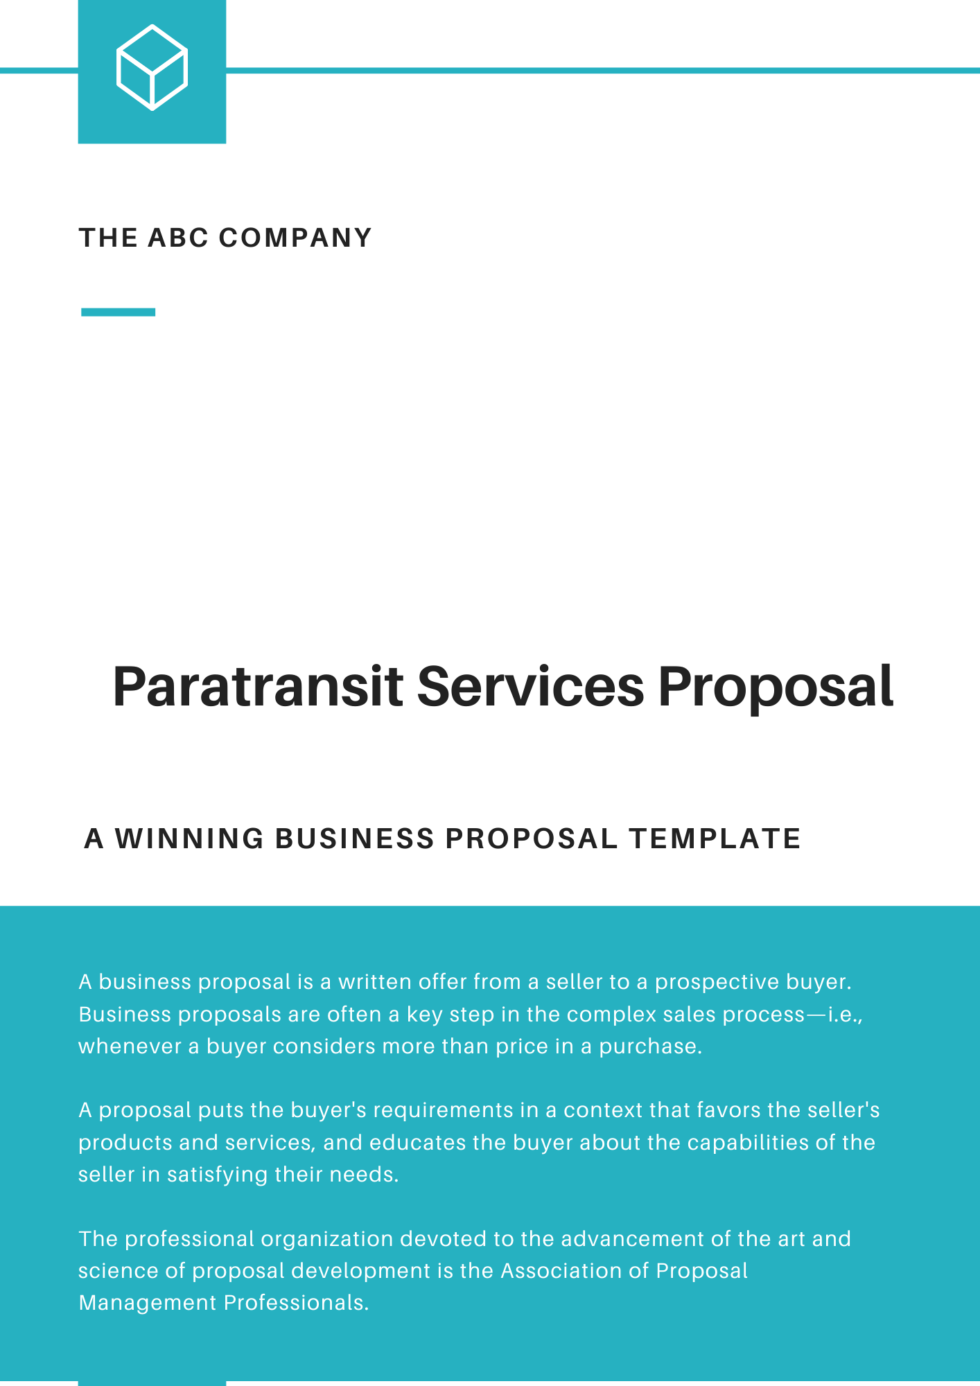 Paratransit Services Proposal Template